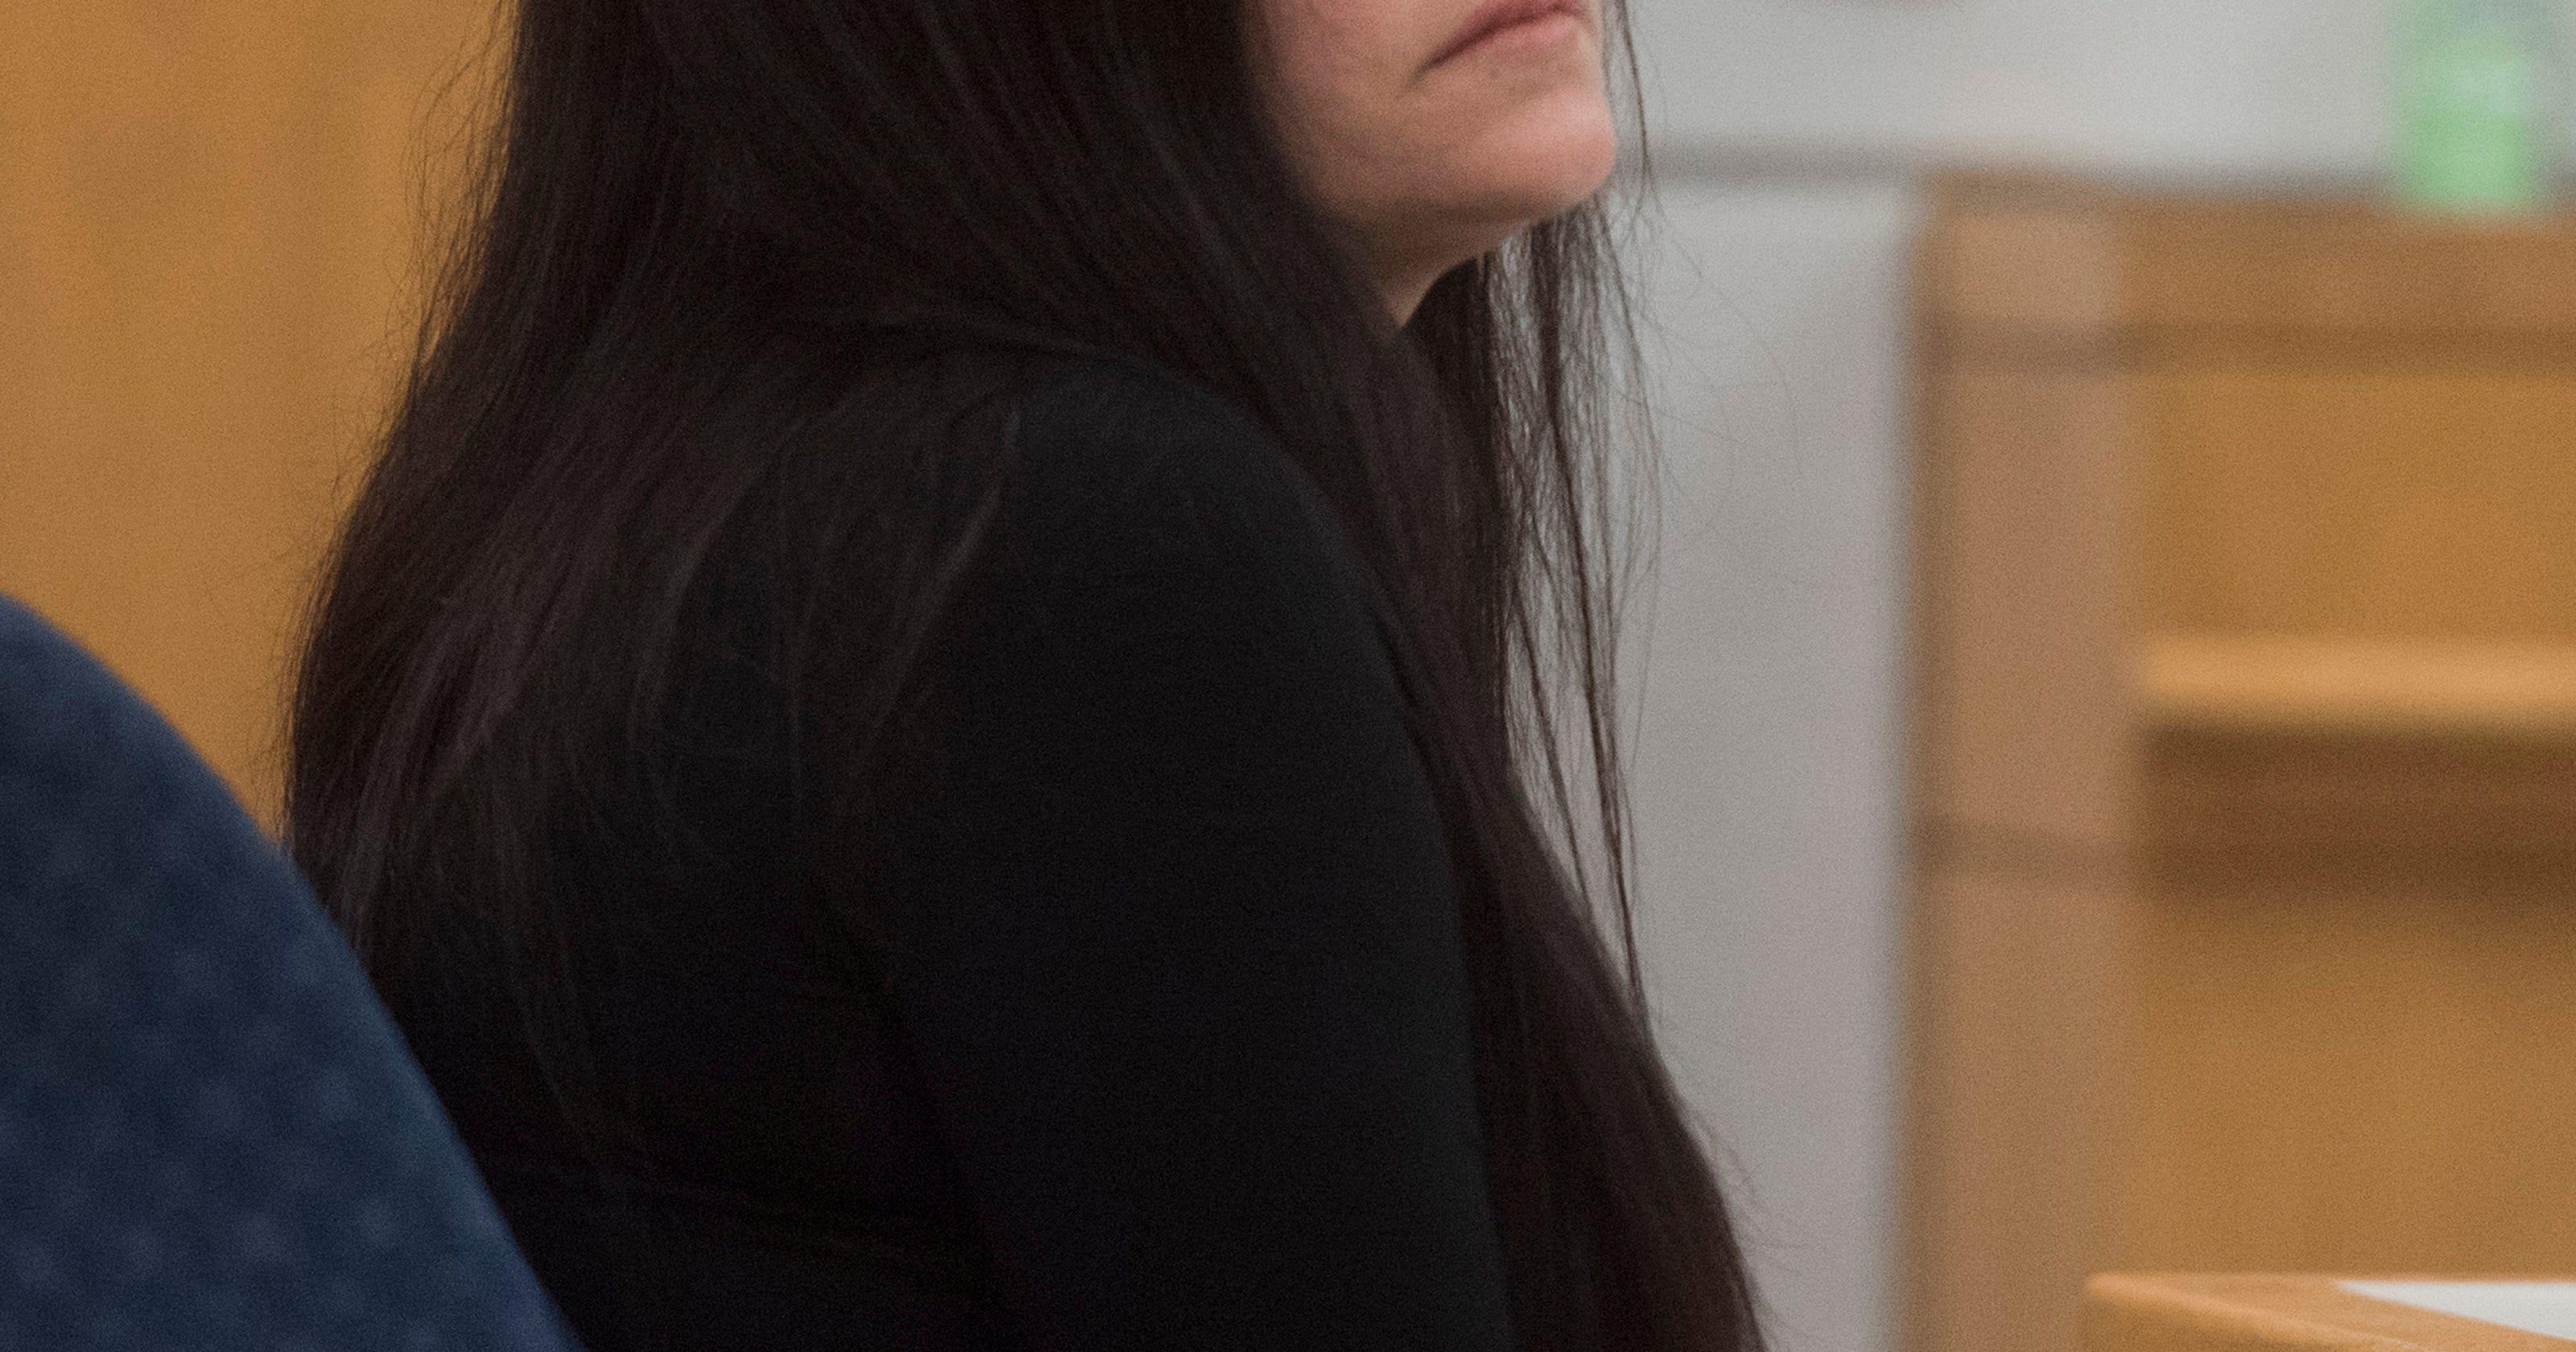 Ashley McArthur found guilty of fraud racketeering, has bond